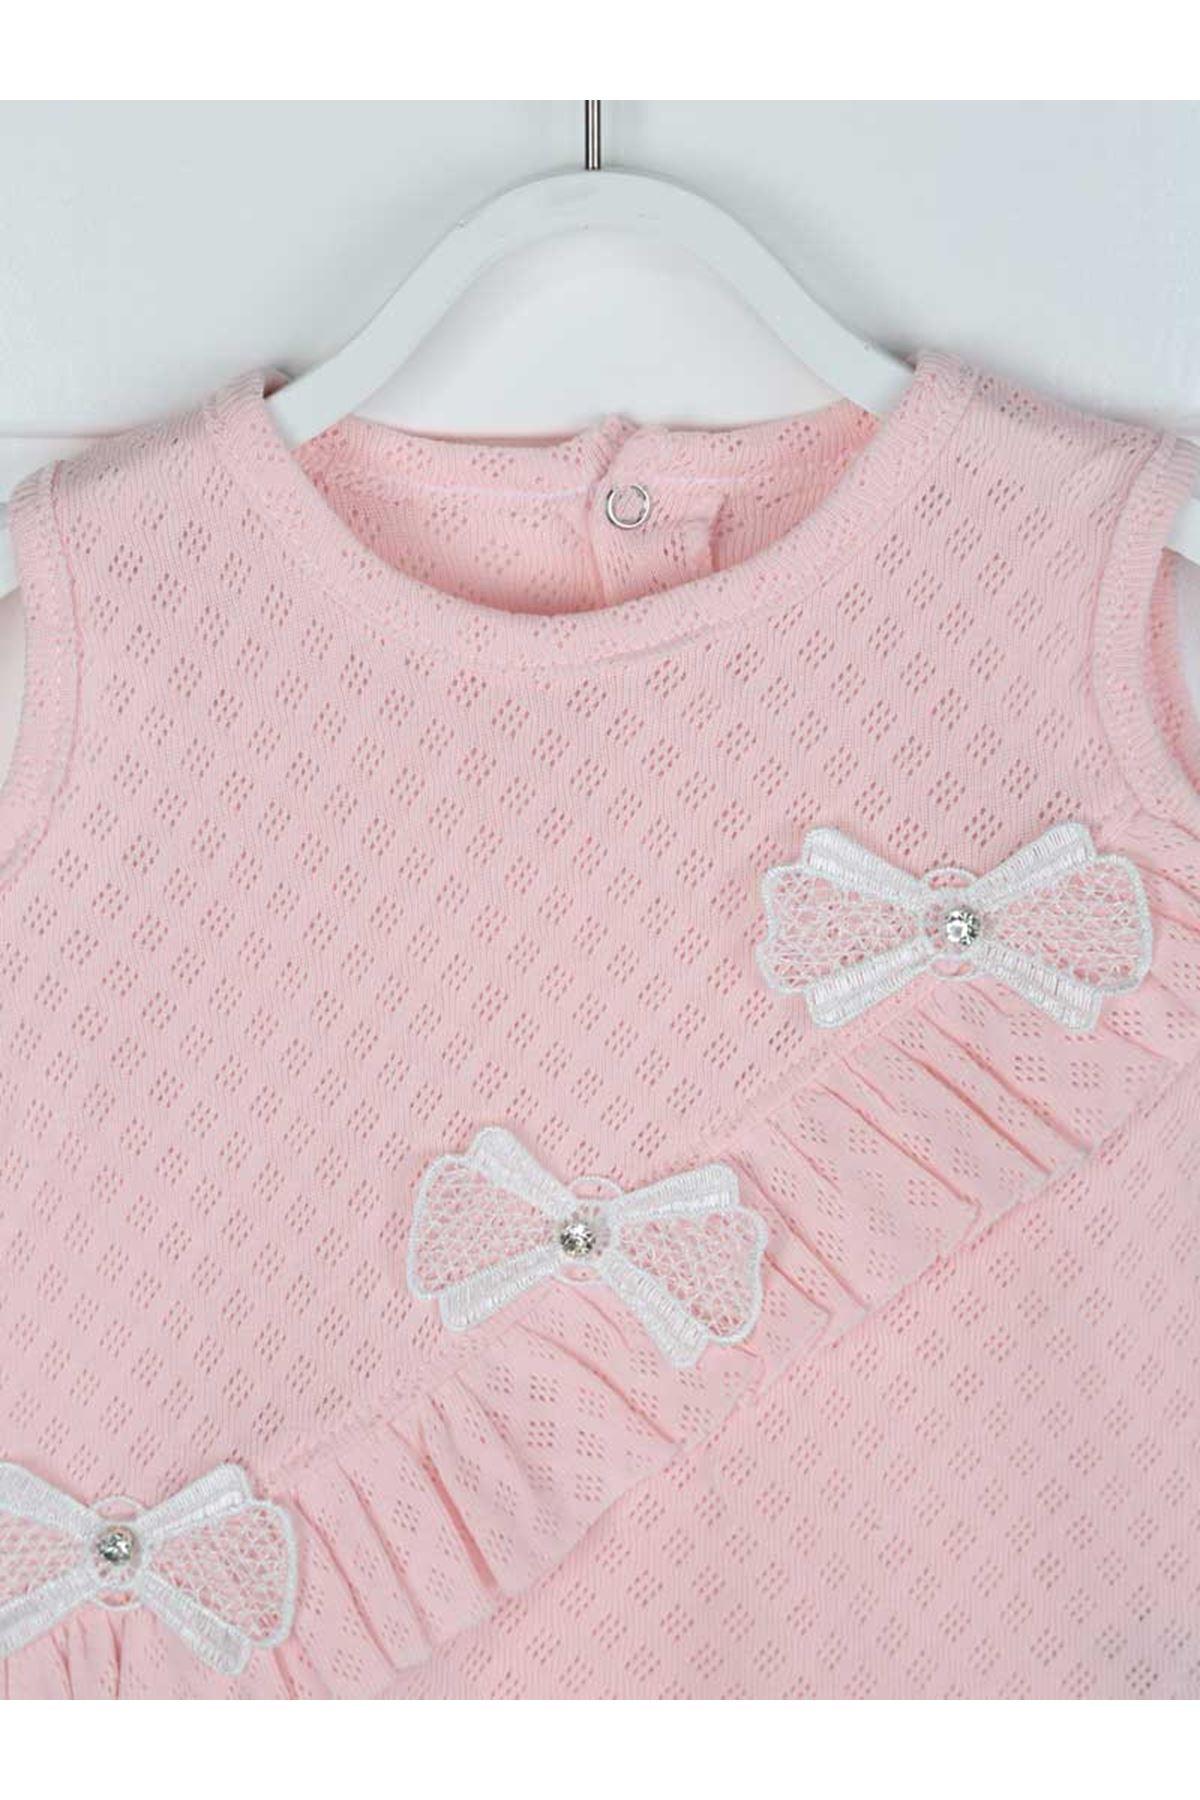 Pembe Yazlık Kız Bebek Külot ve Elbise